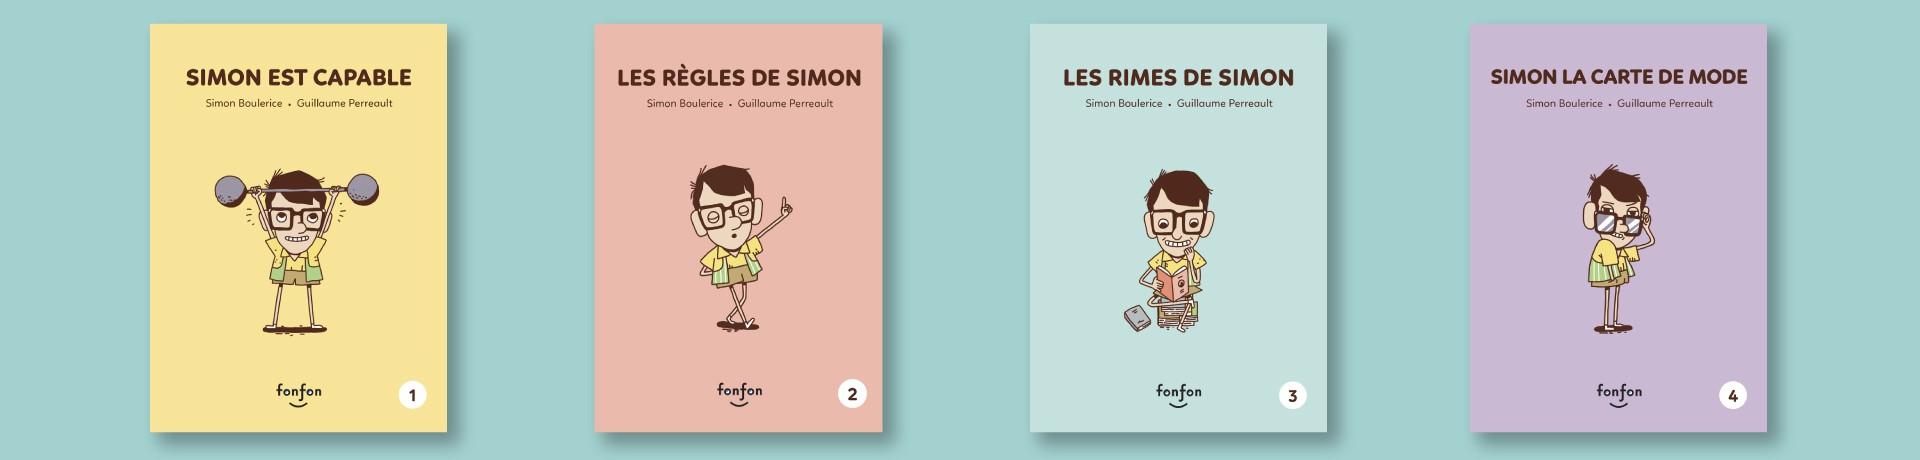 Simon-Bandeau-1980x460